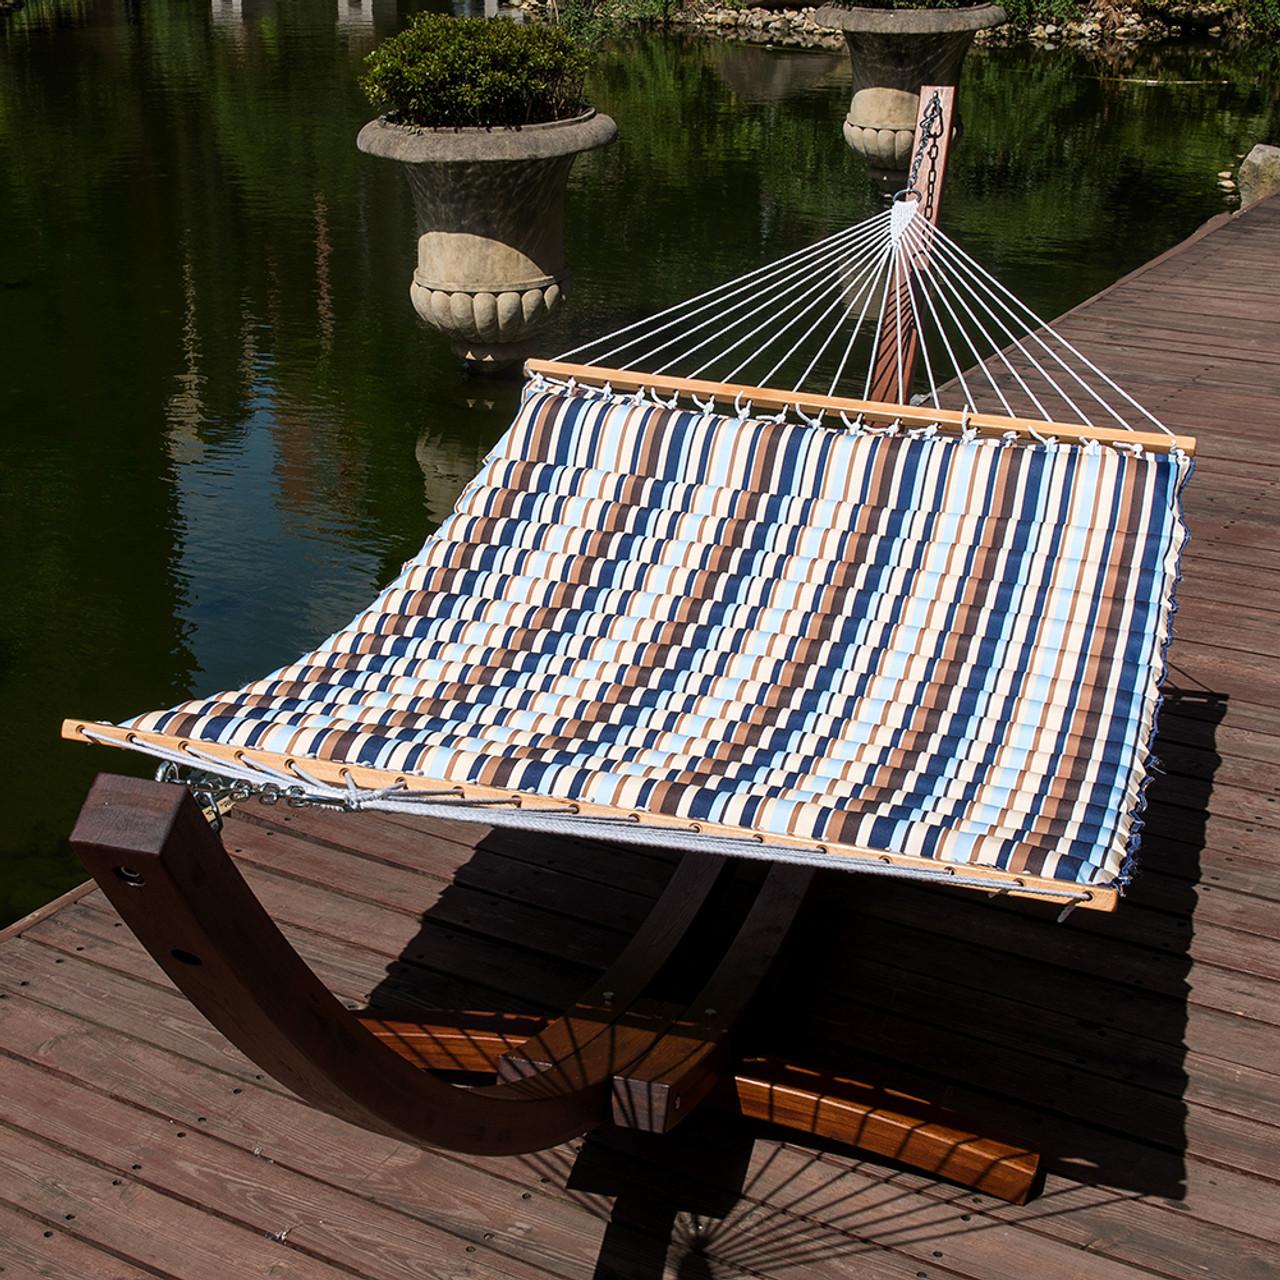 lazy daze hammocks 58 inch double size pillow top hammock swing bed with spreader bar heavy double pillow top hammock  seaside   rh   sundaleoutdoor